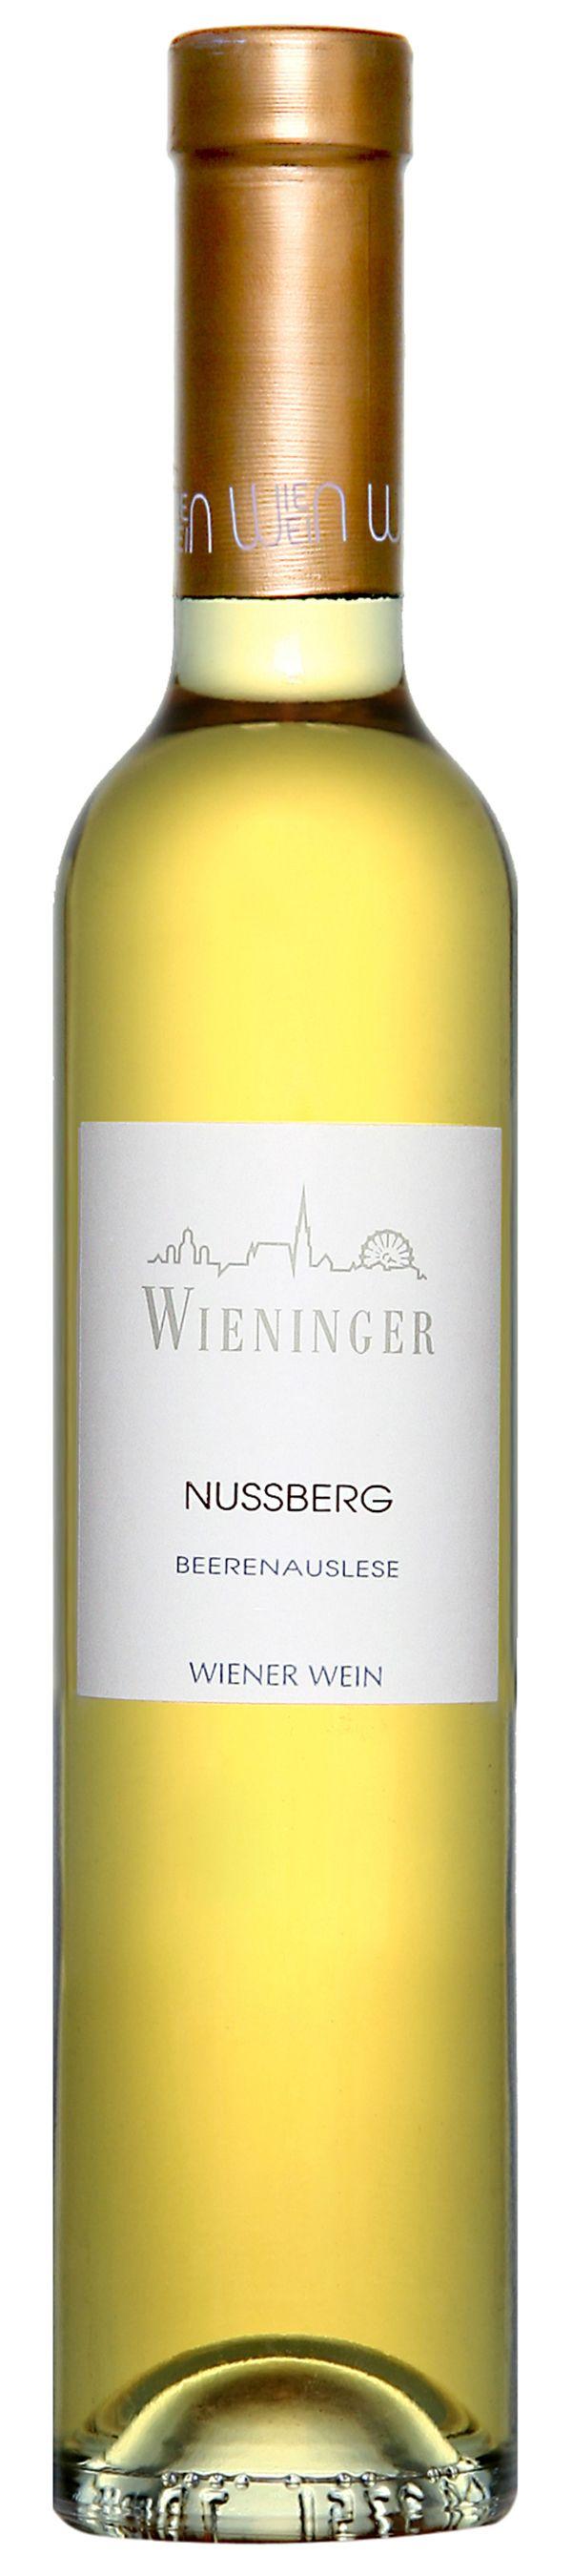 Nussberg Beerenauslese | The Winebow Group